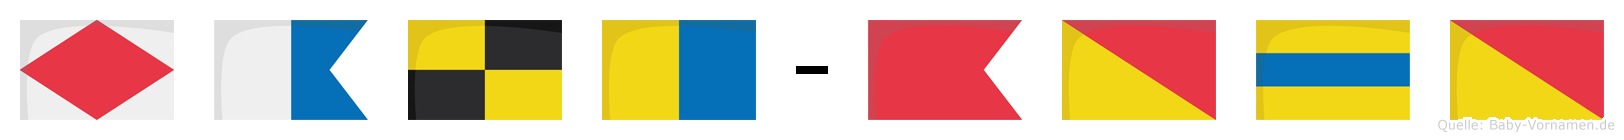 Falk-Bodo im Flaggenalphabet